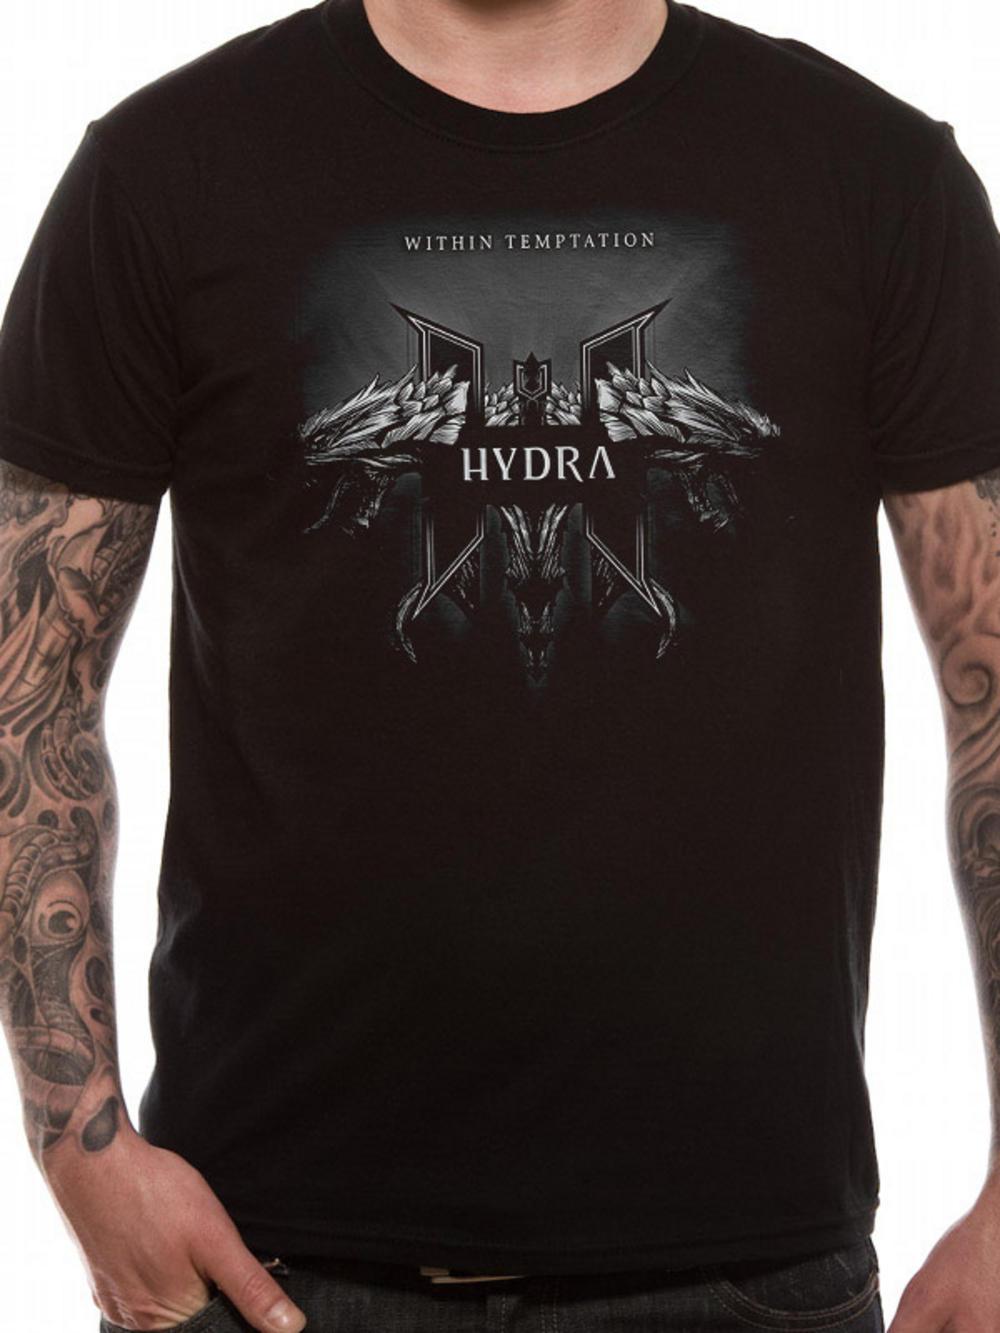 Within Temptation (Hydra Grey) T-shirt